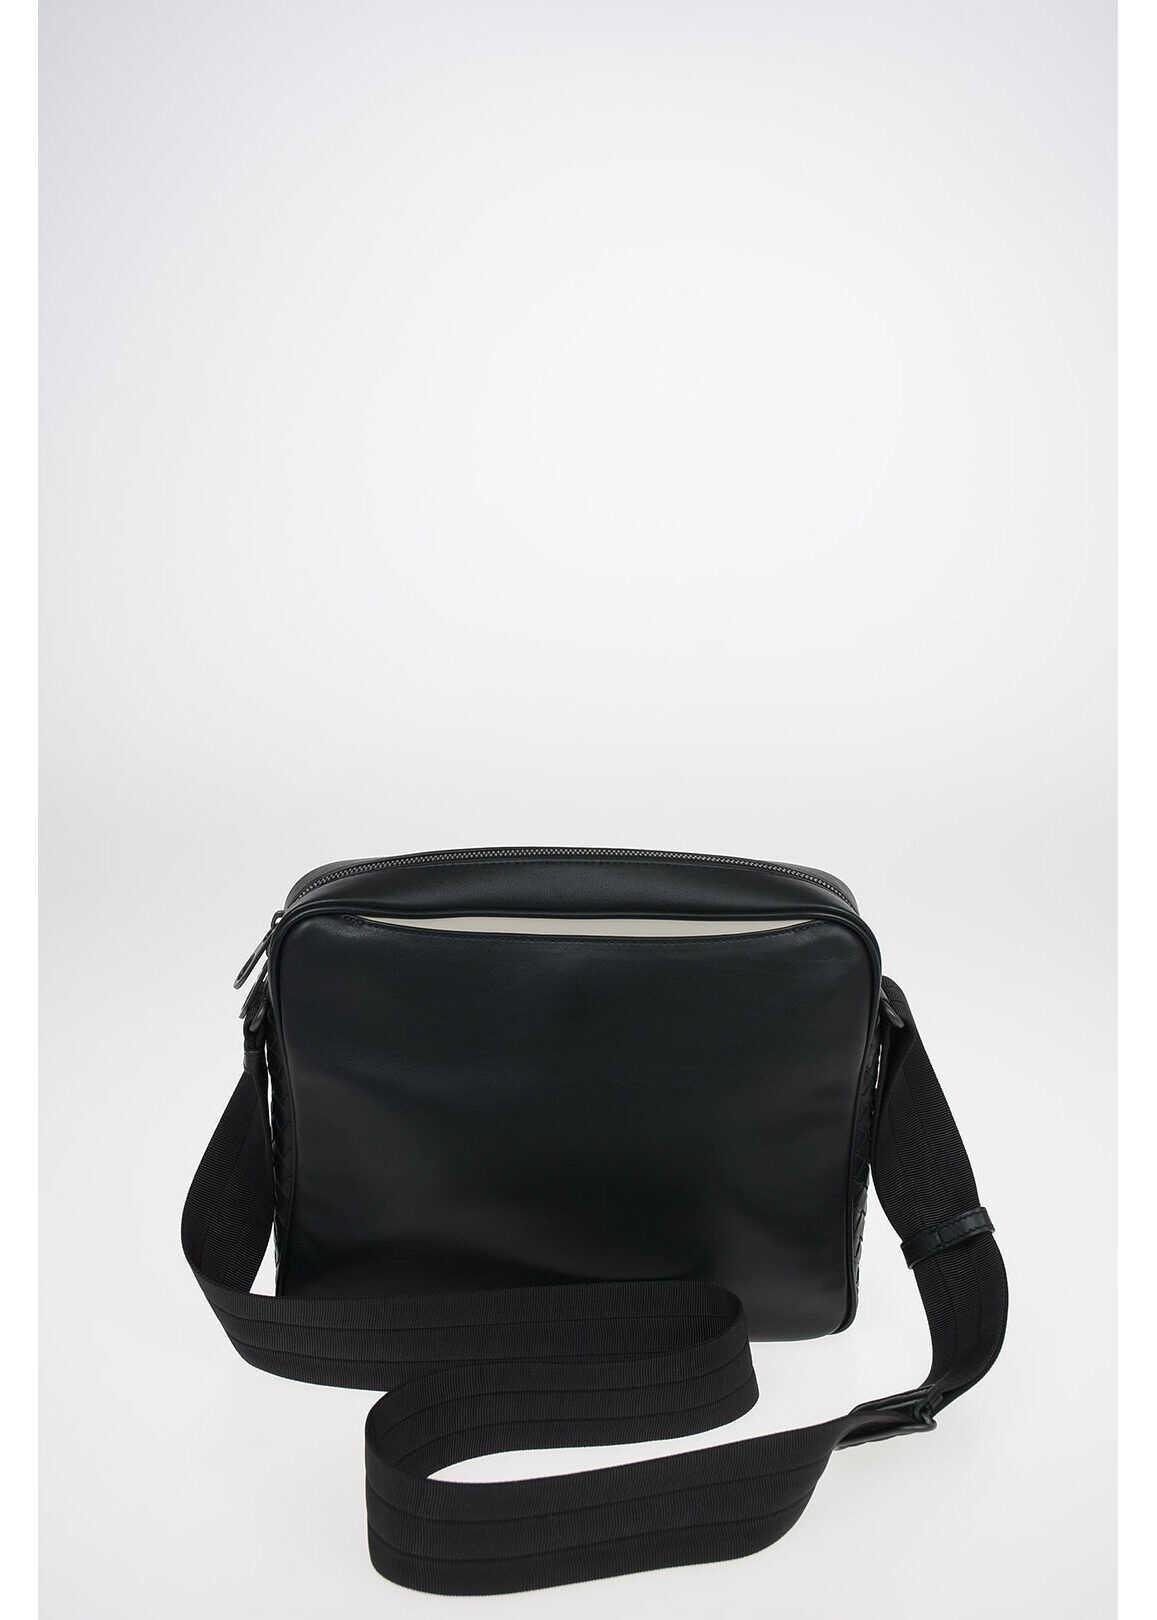 Bottega Veneta Leather Shoulder Briefcase with Magnet Pocket Closure BLACK imagine b-mall.ro